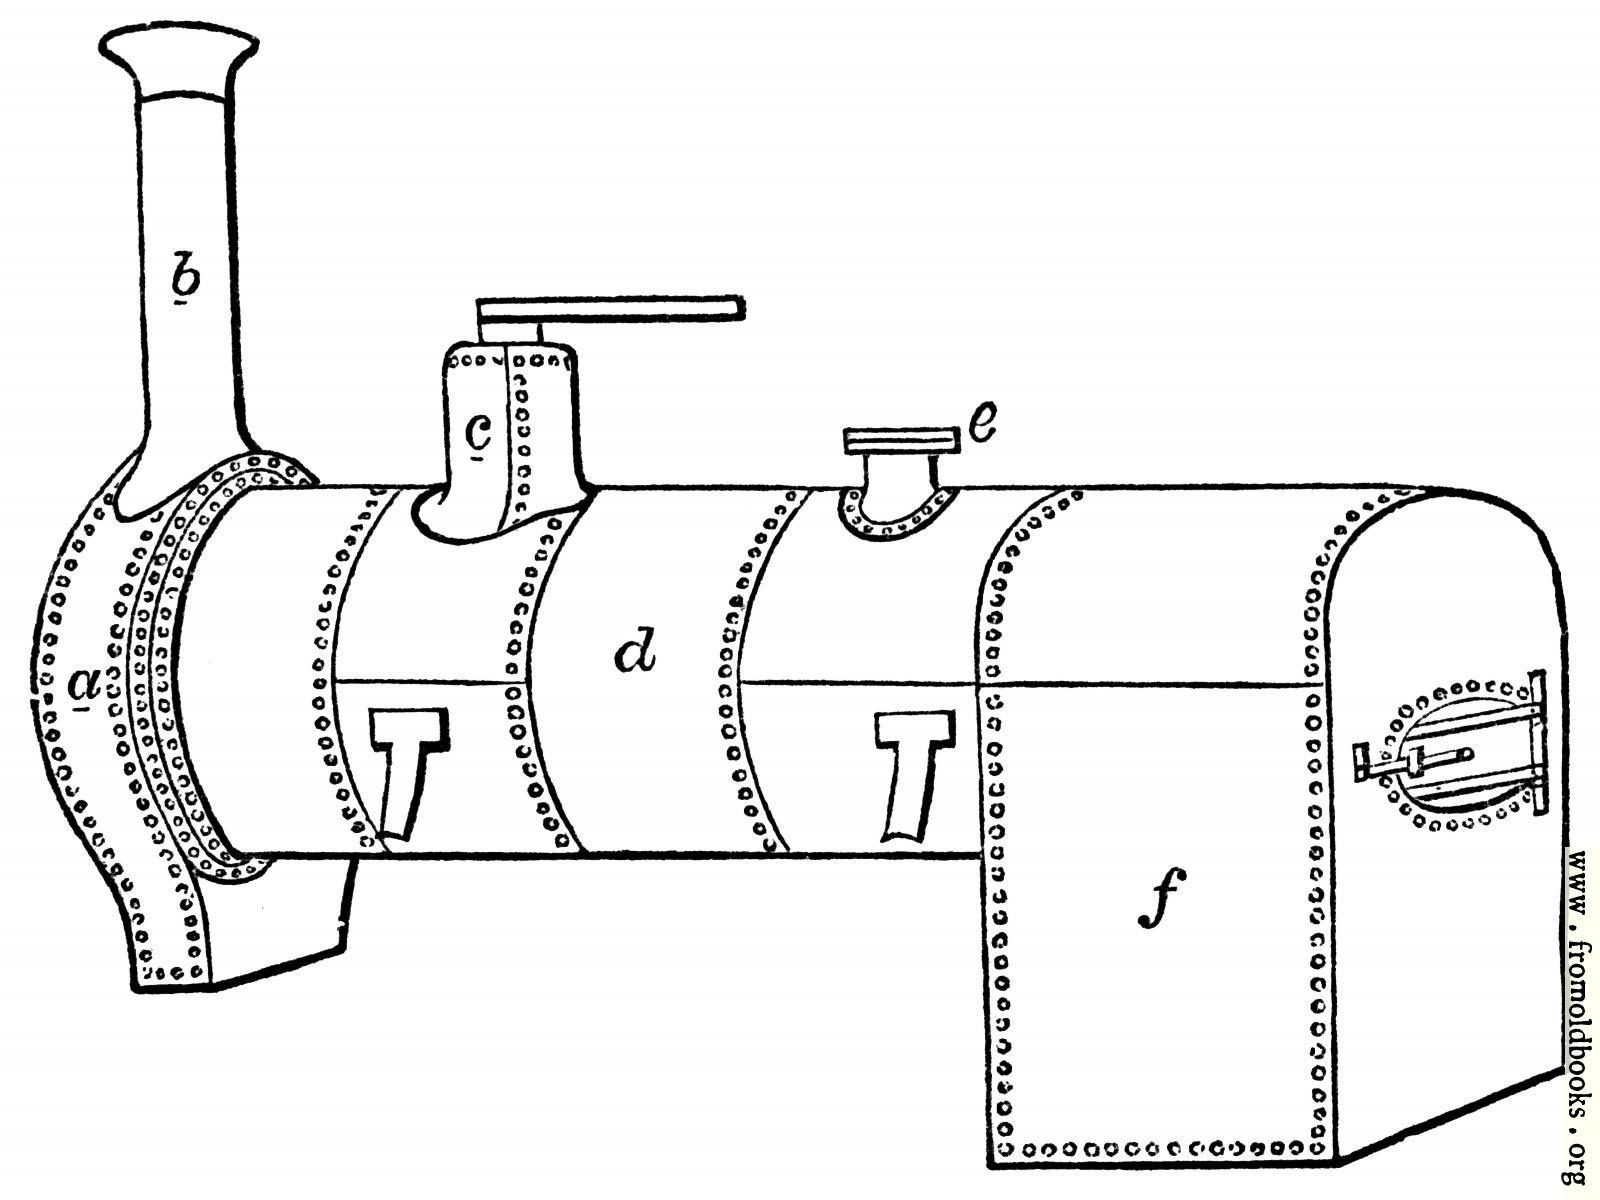 locomotive boiler diagram